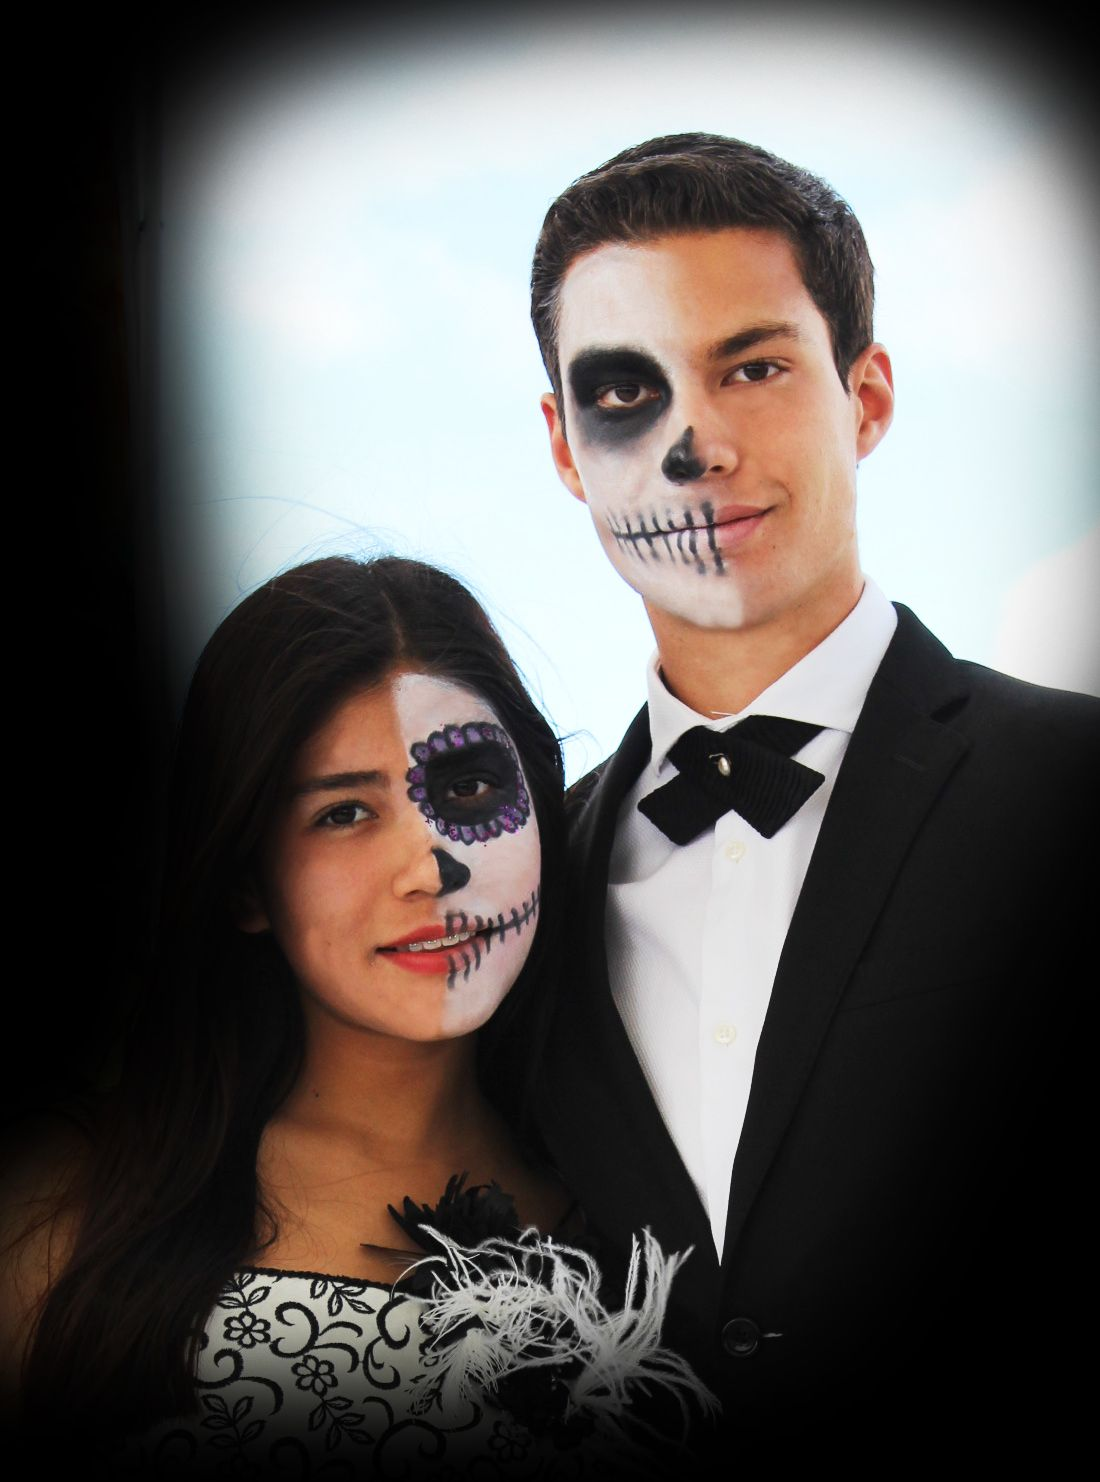 catrina disfraz maquillaje escolar pareja dia de muertos